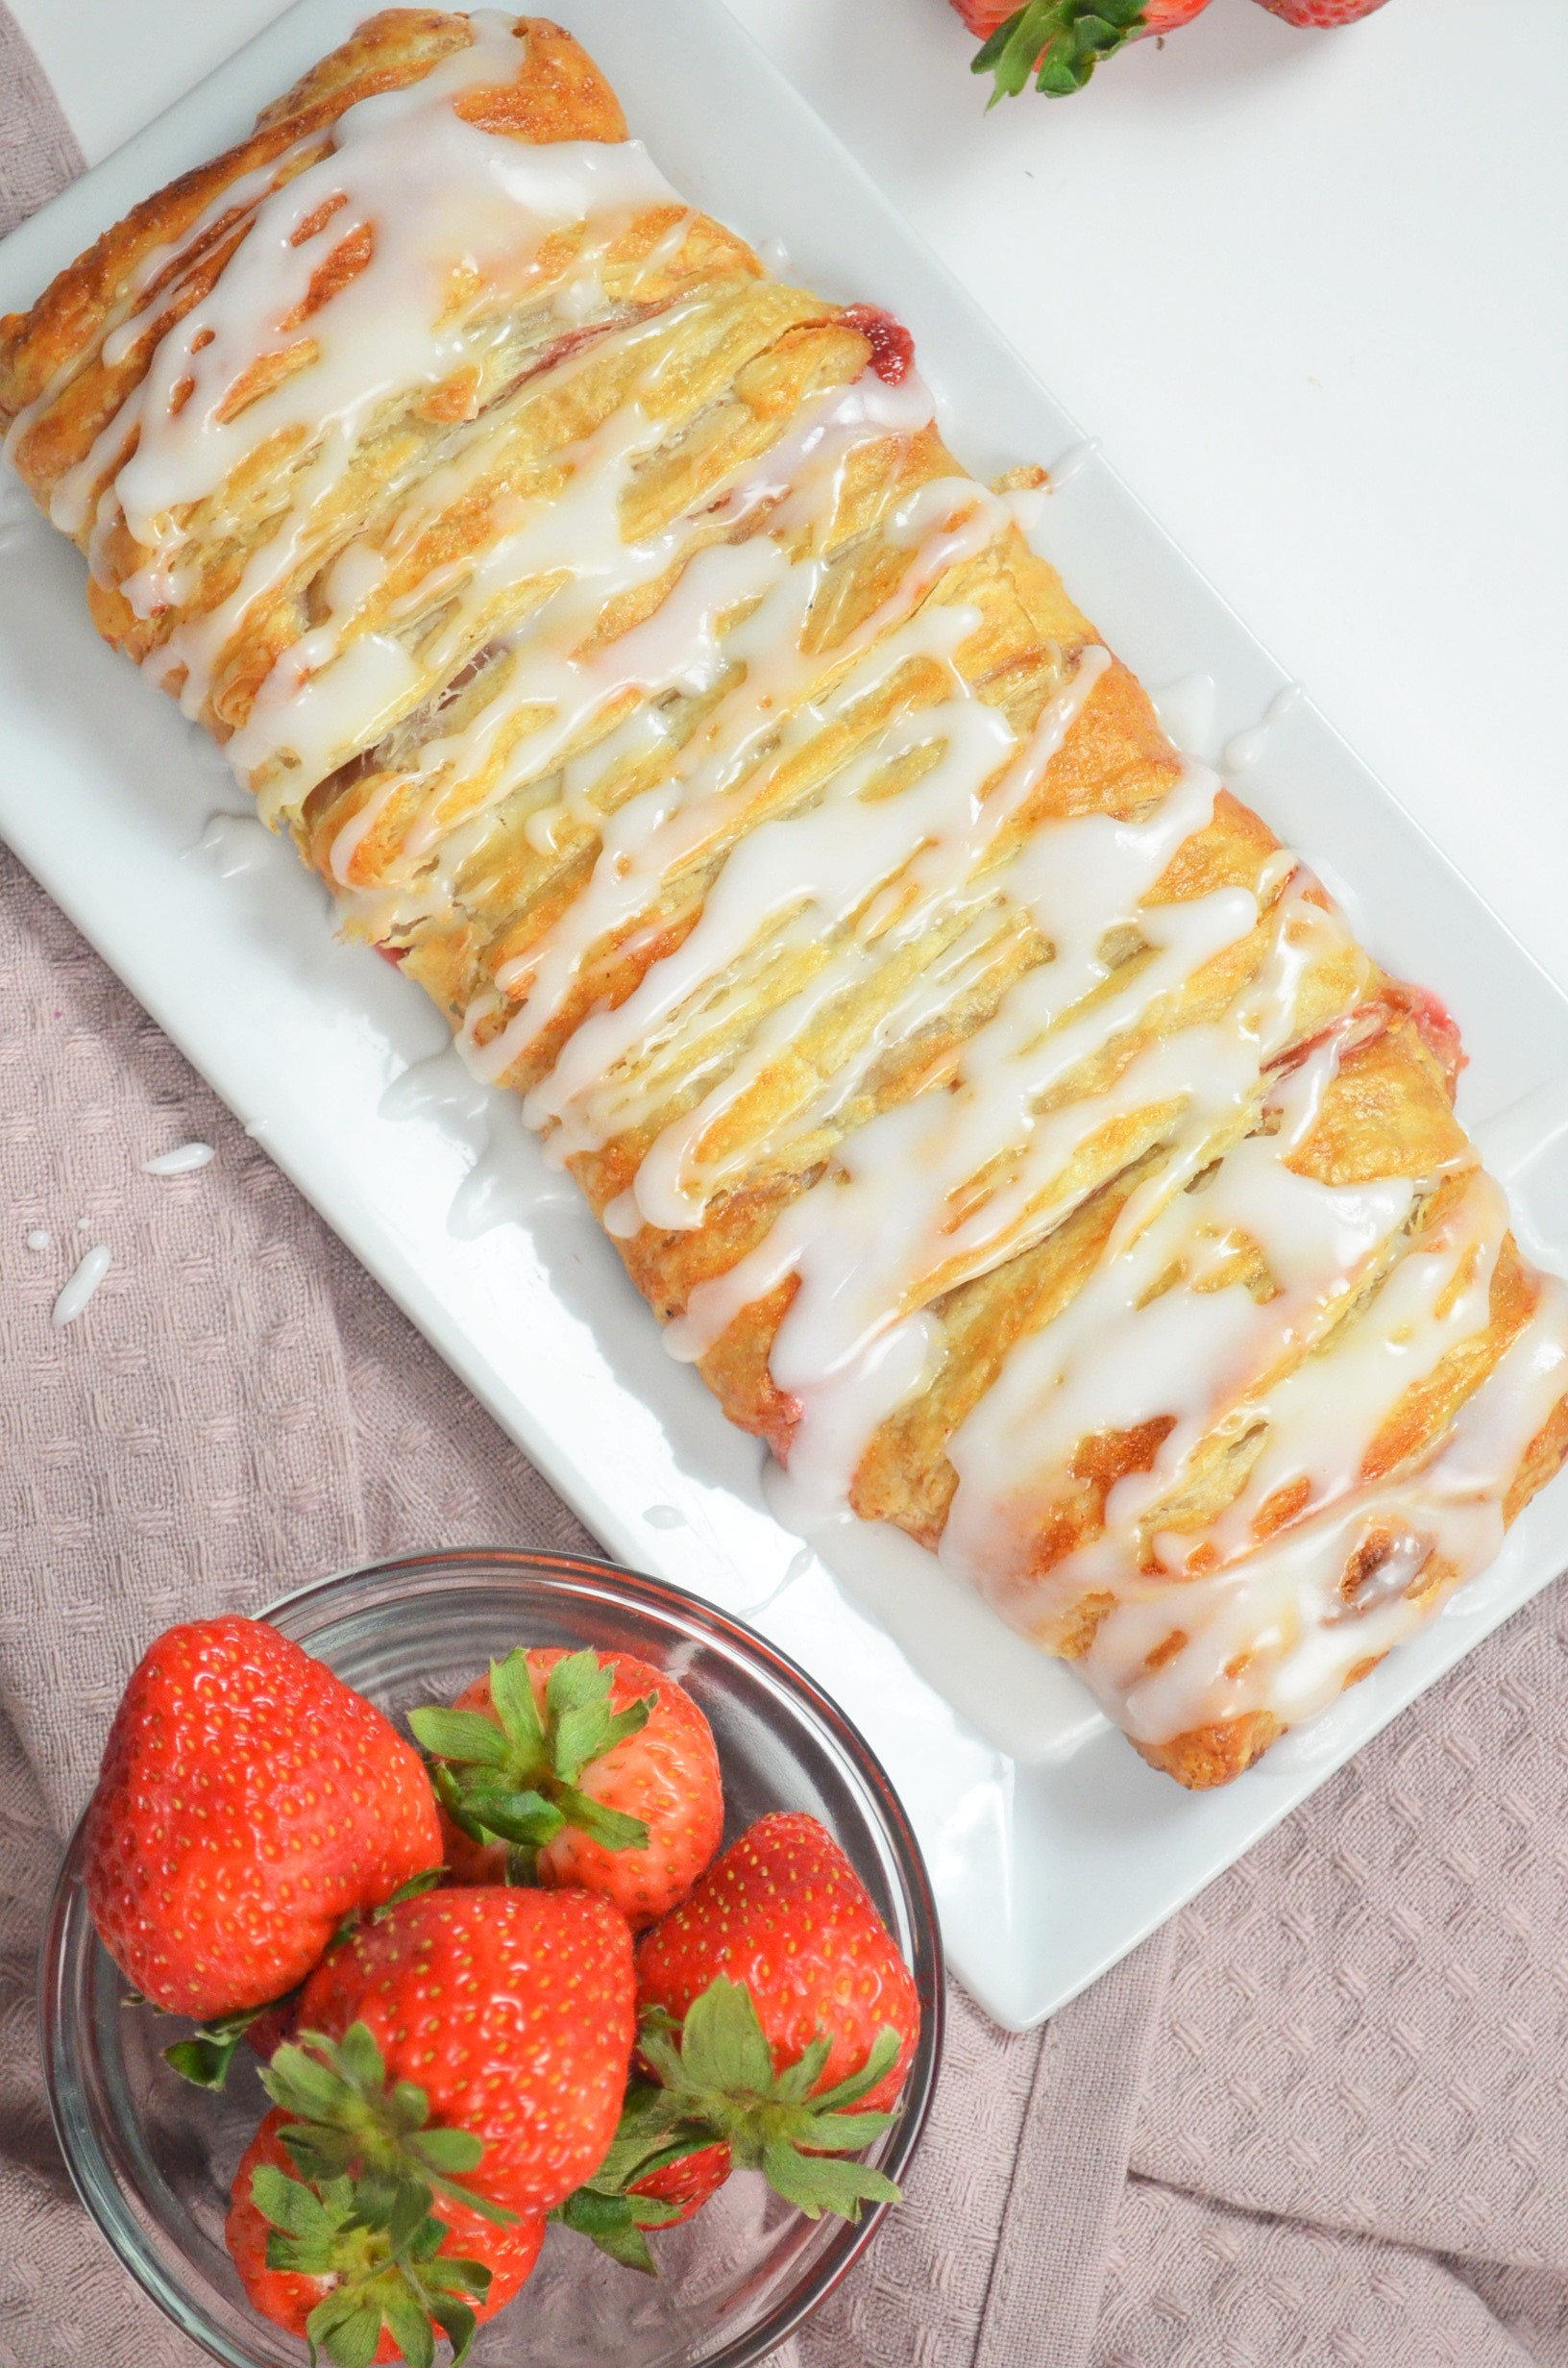 Braided Strawberry Puff Pastry